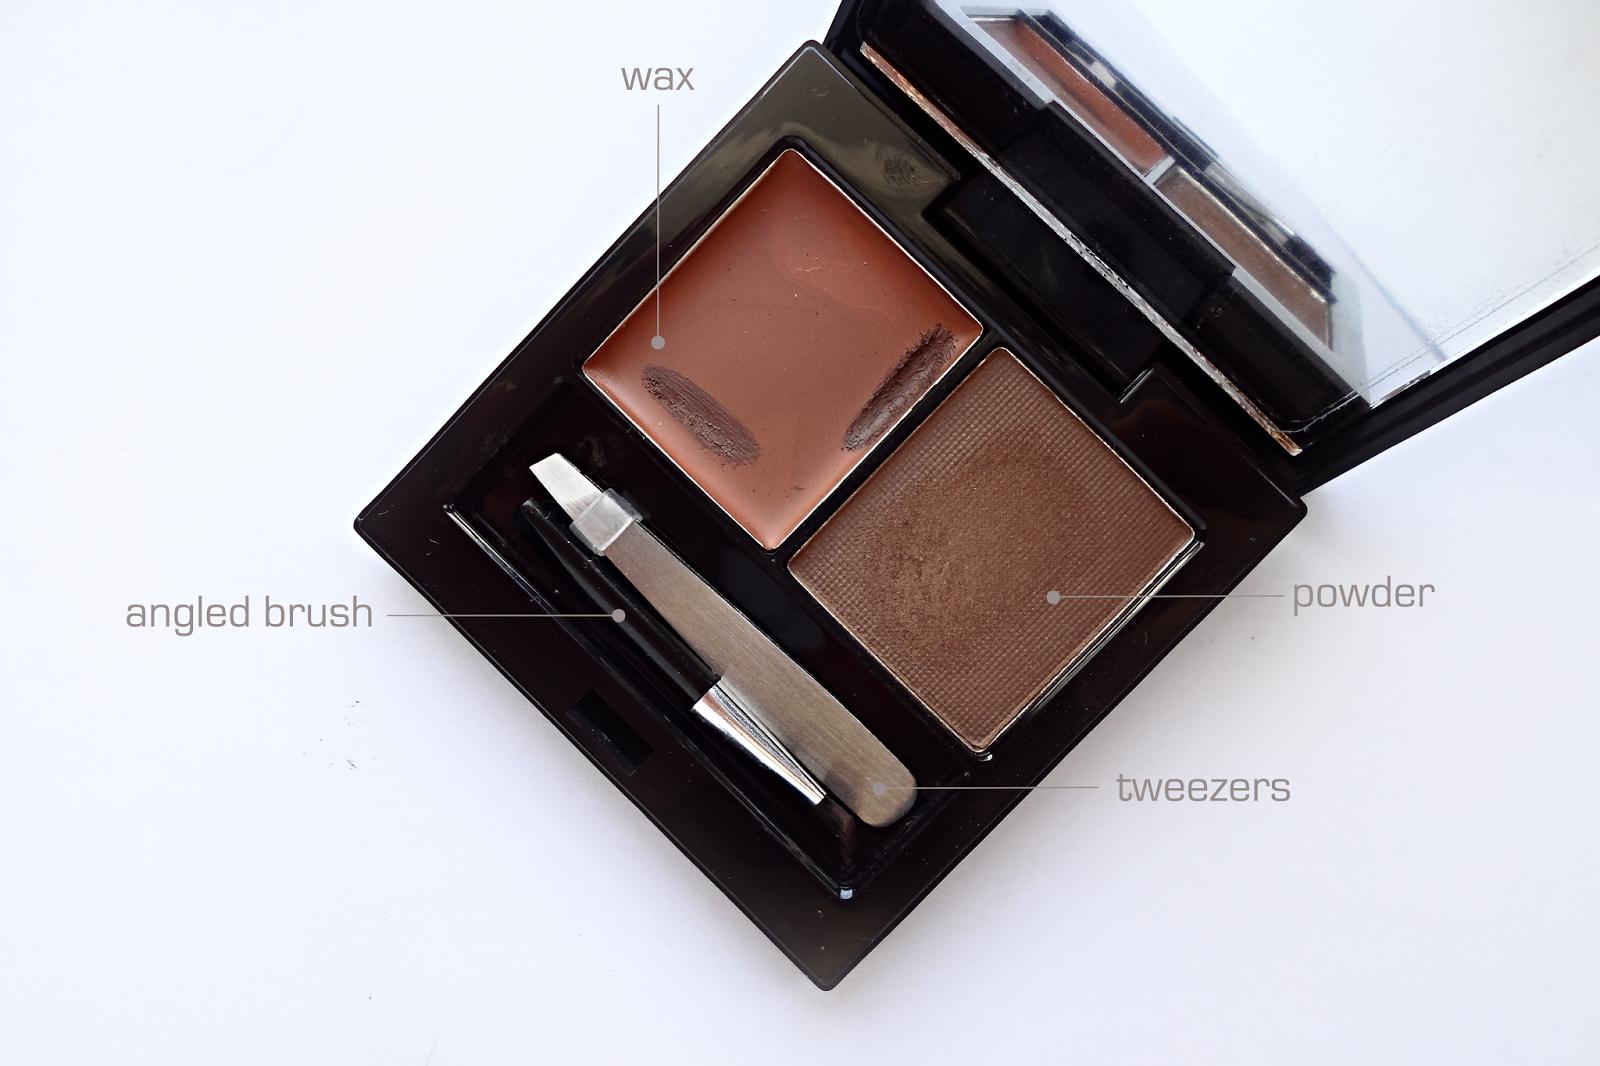 models prefer essential brow kit, brow powder, wax, models prefer, priceline, review, twoplicates, australia